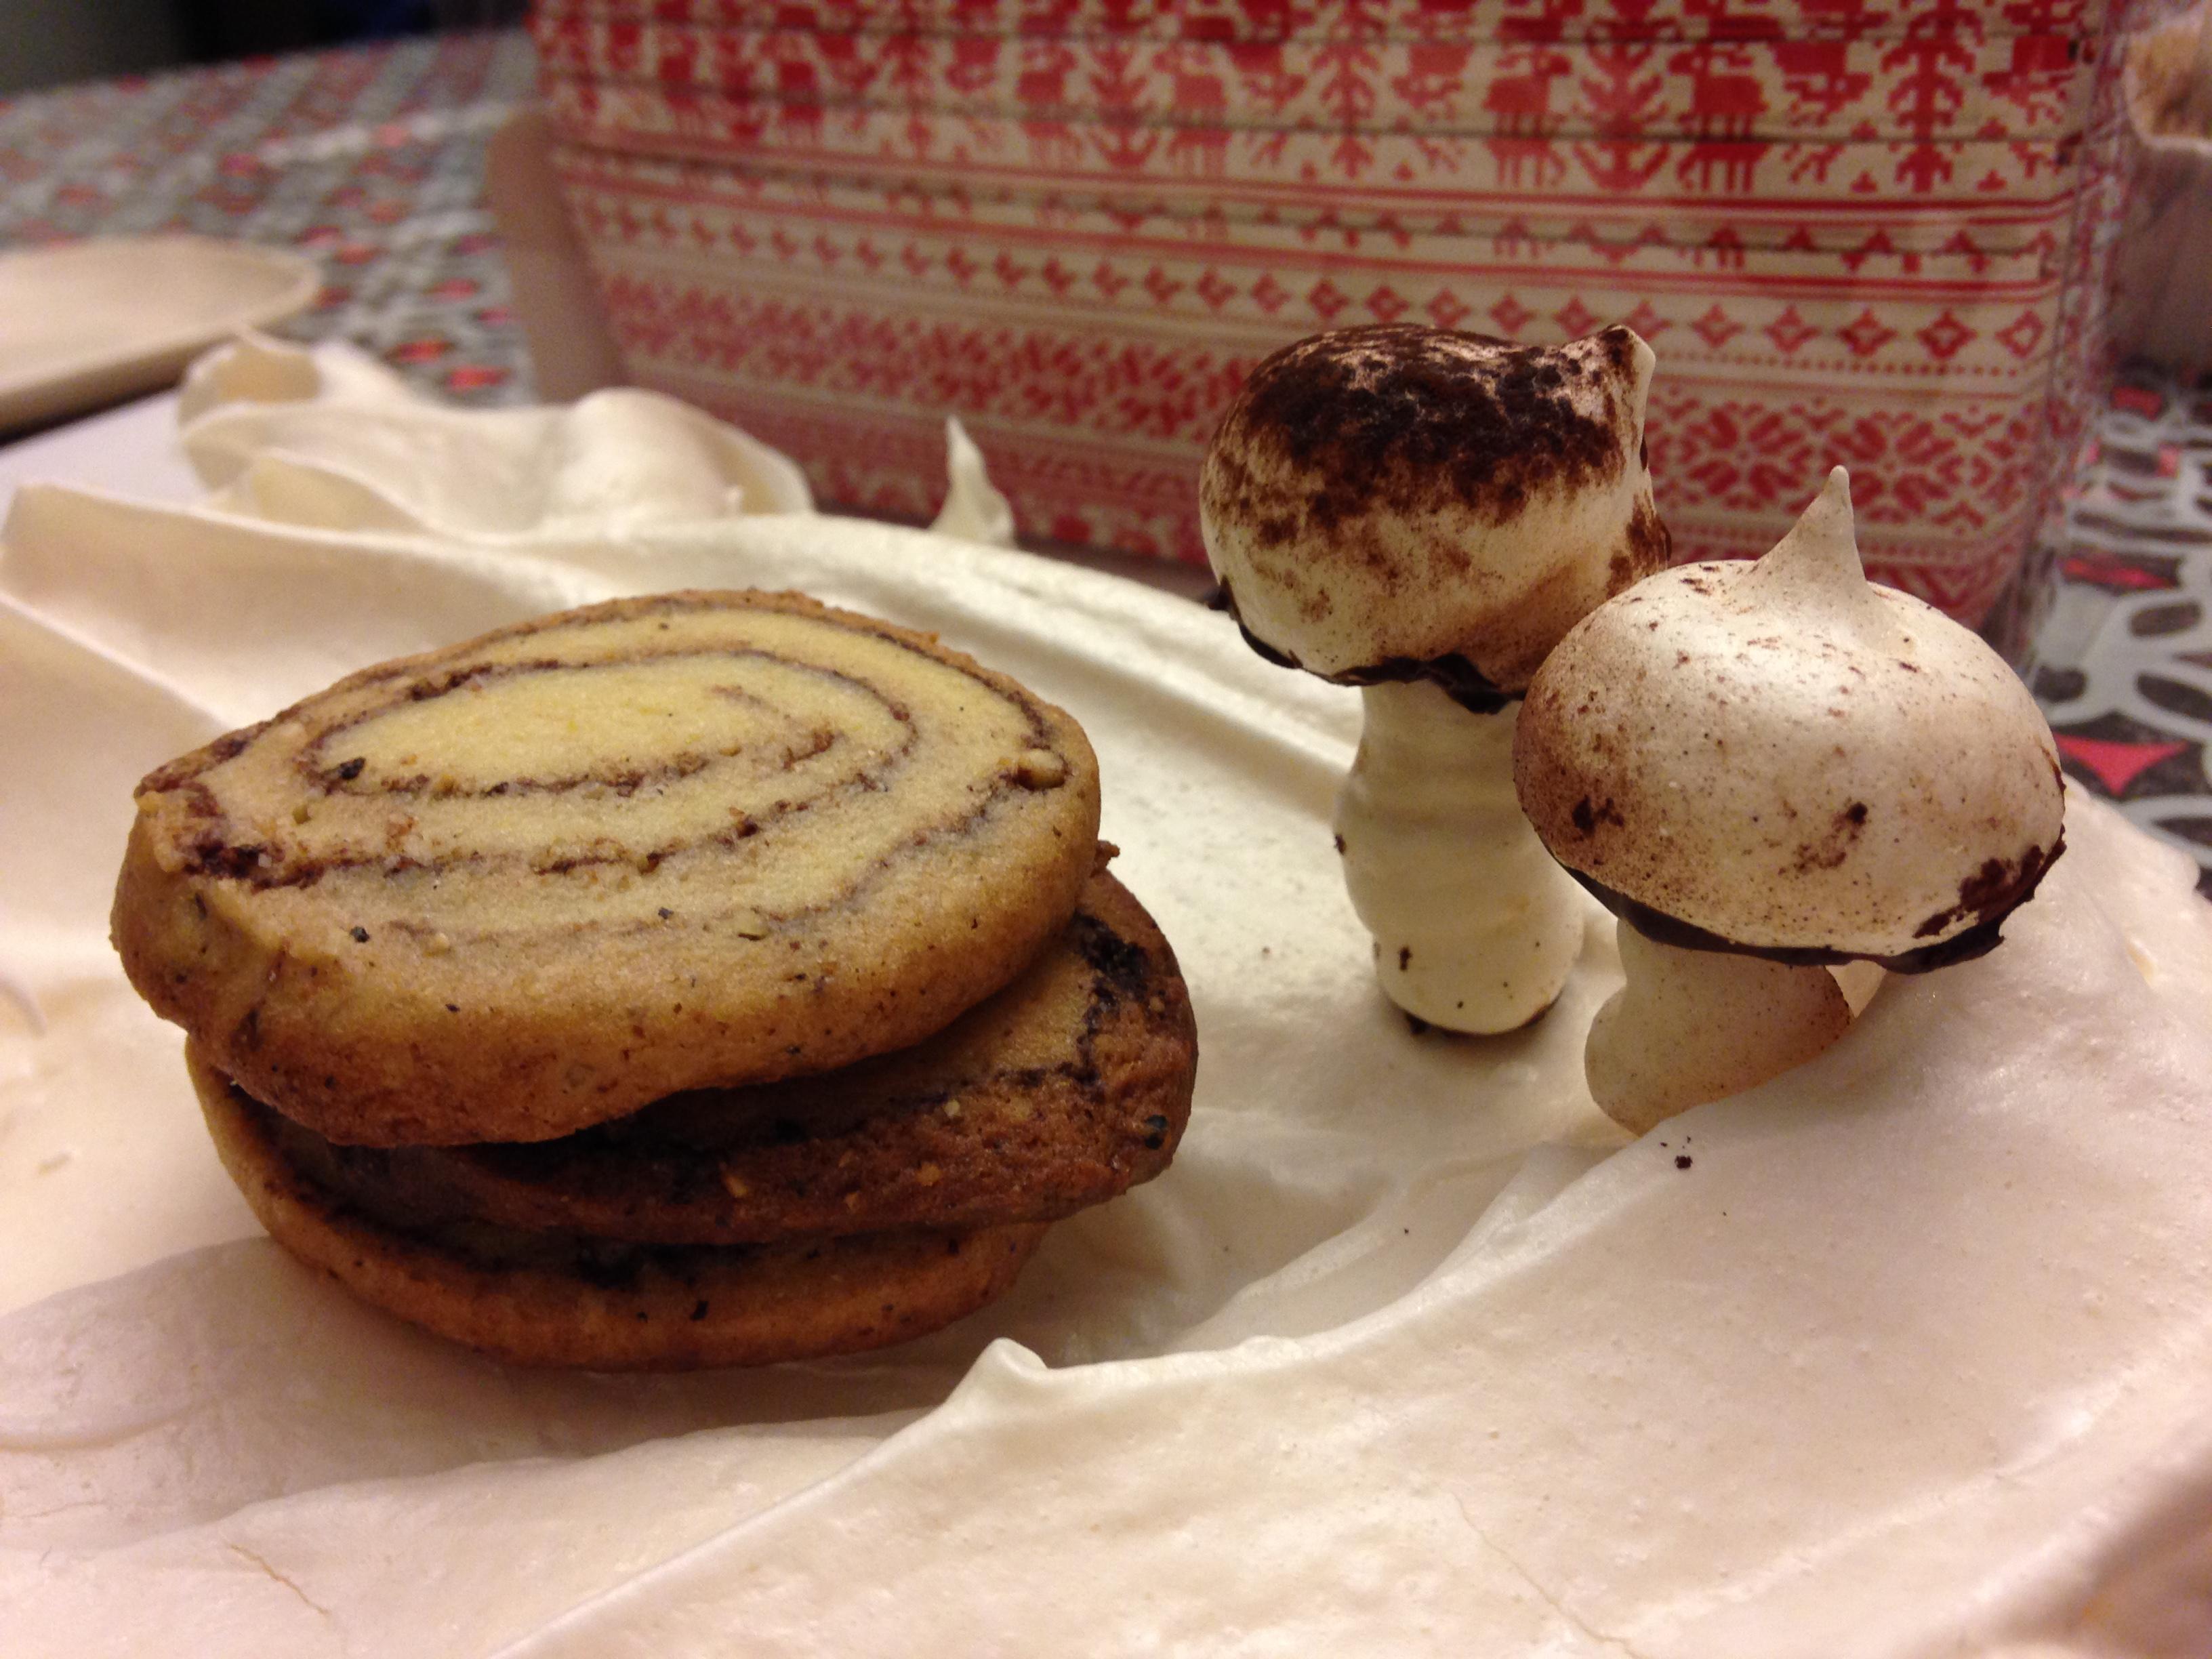 Chocolate Hazelnut Spiced Yule Log Cookies (Recipe) | Leah's Life ...